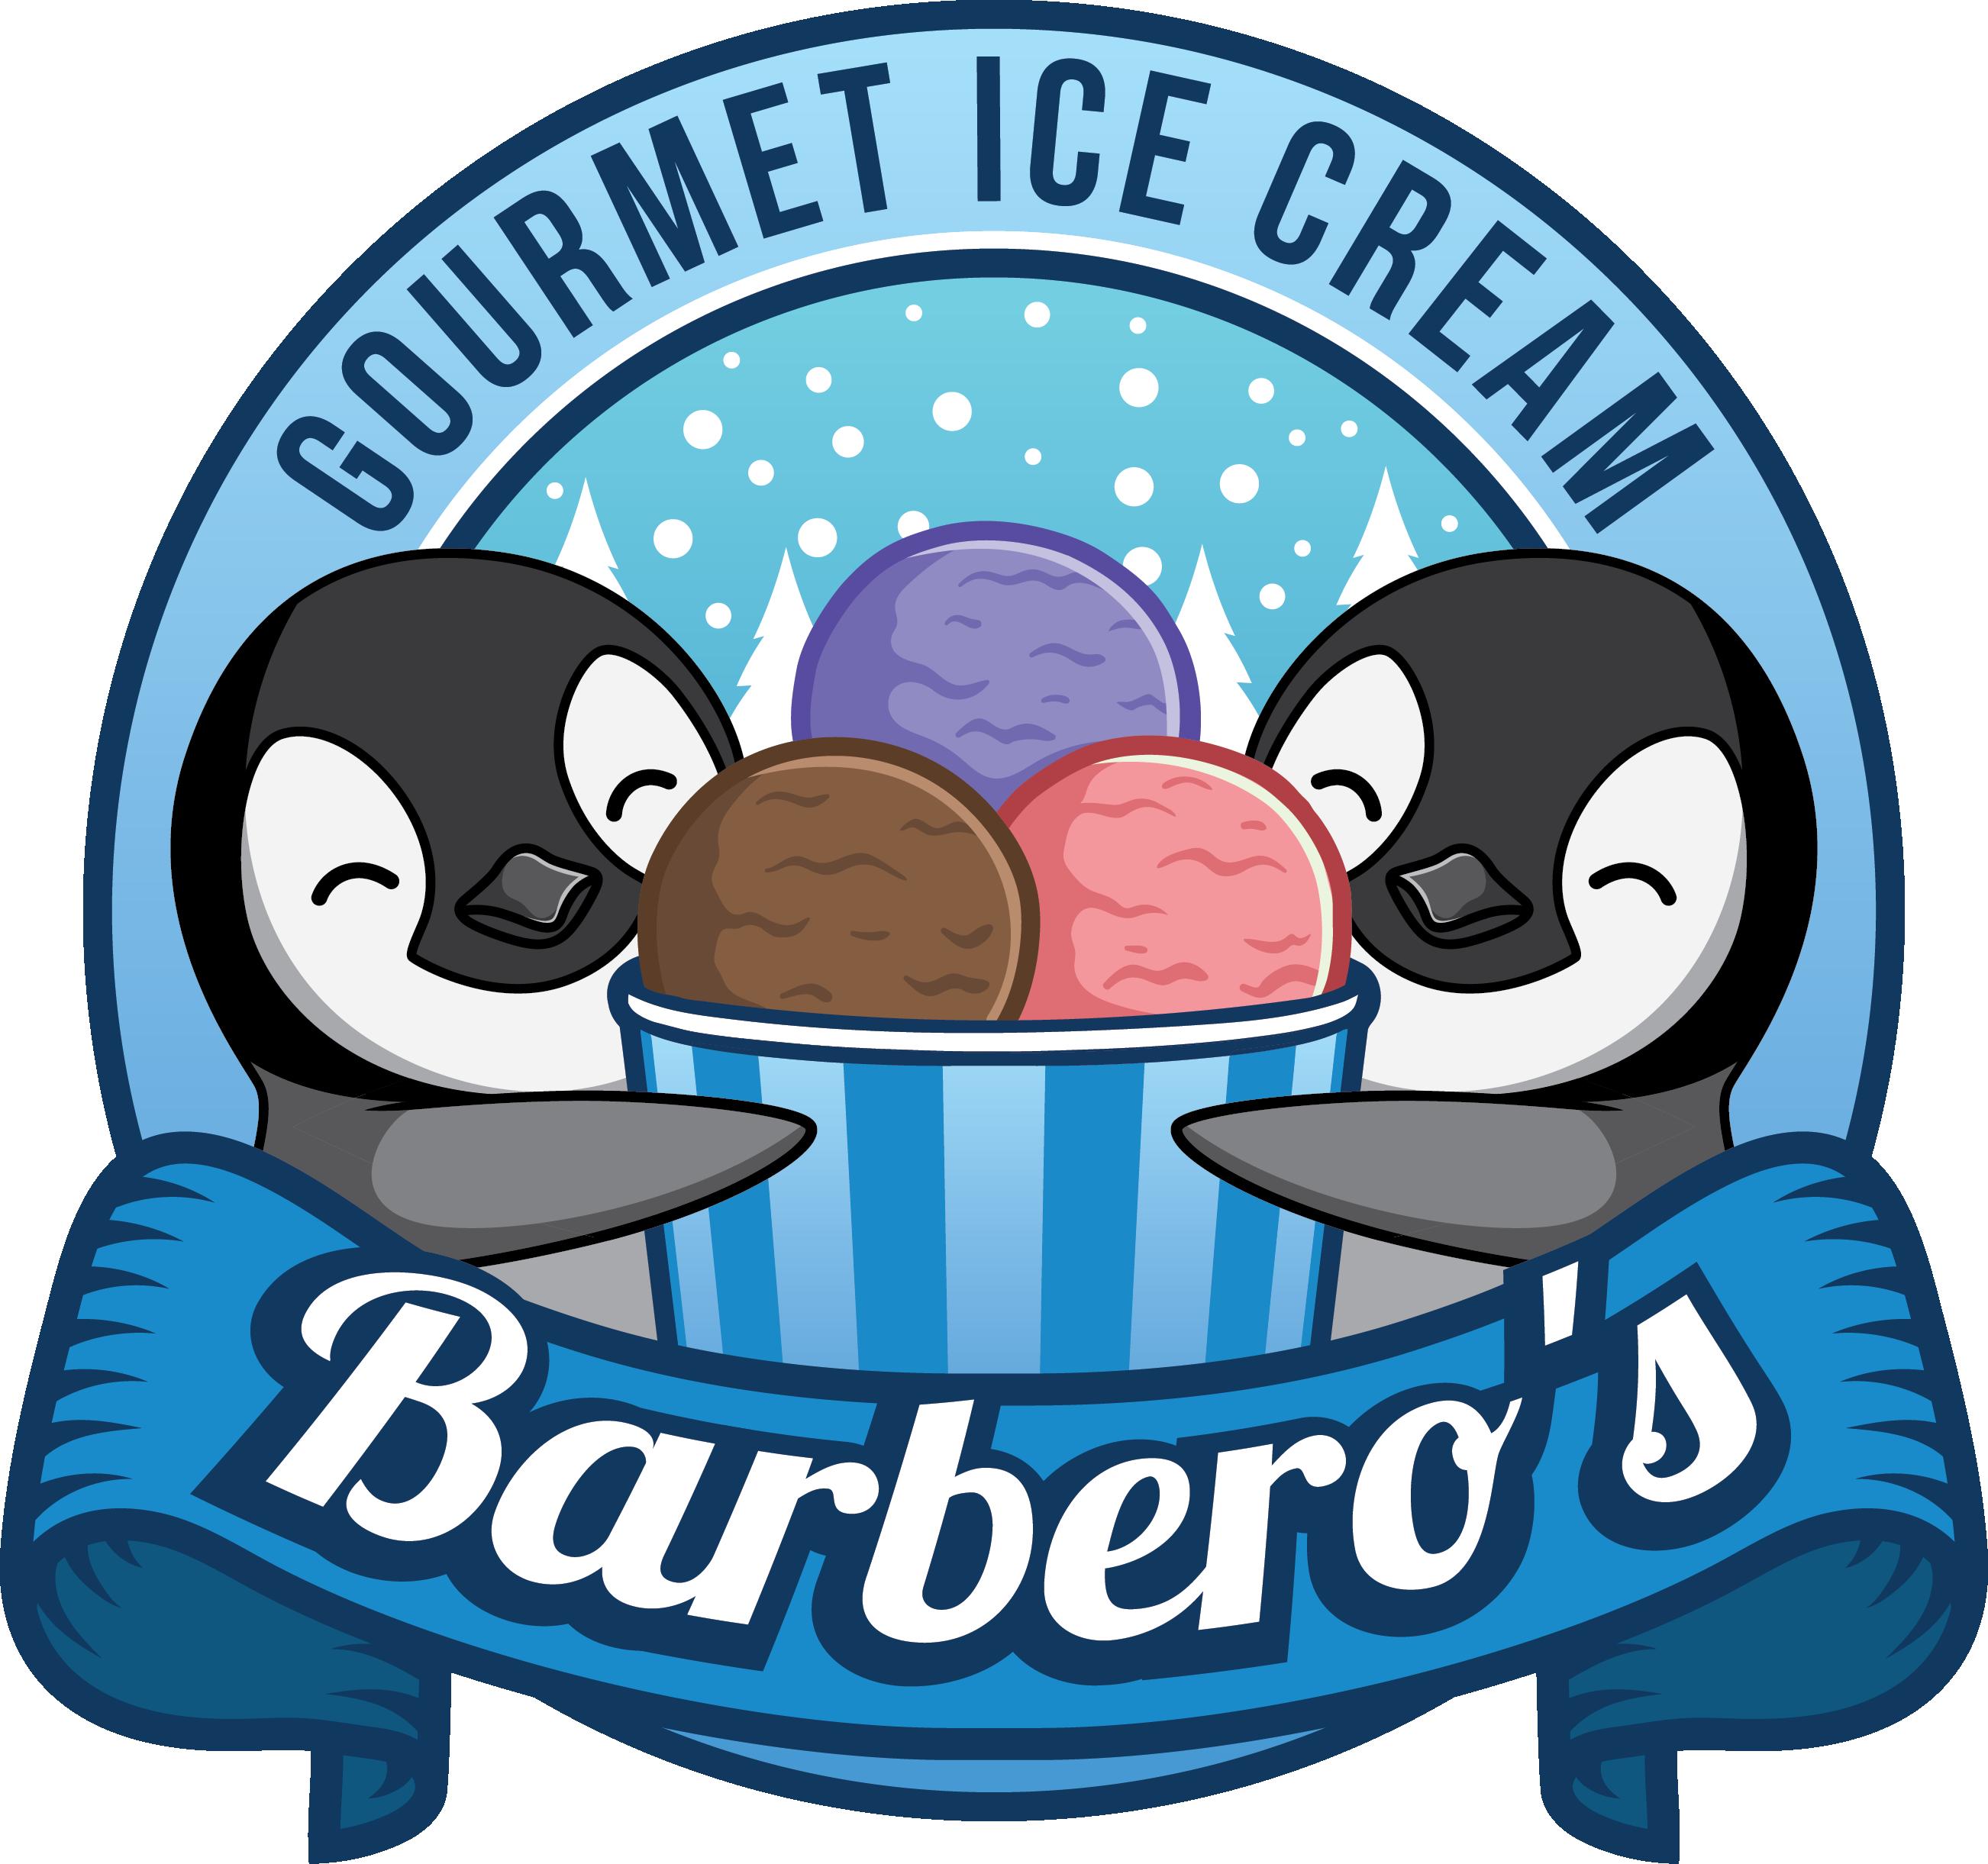 Logo design for gourmet ice cream brand